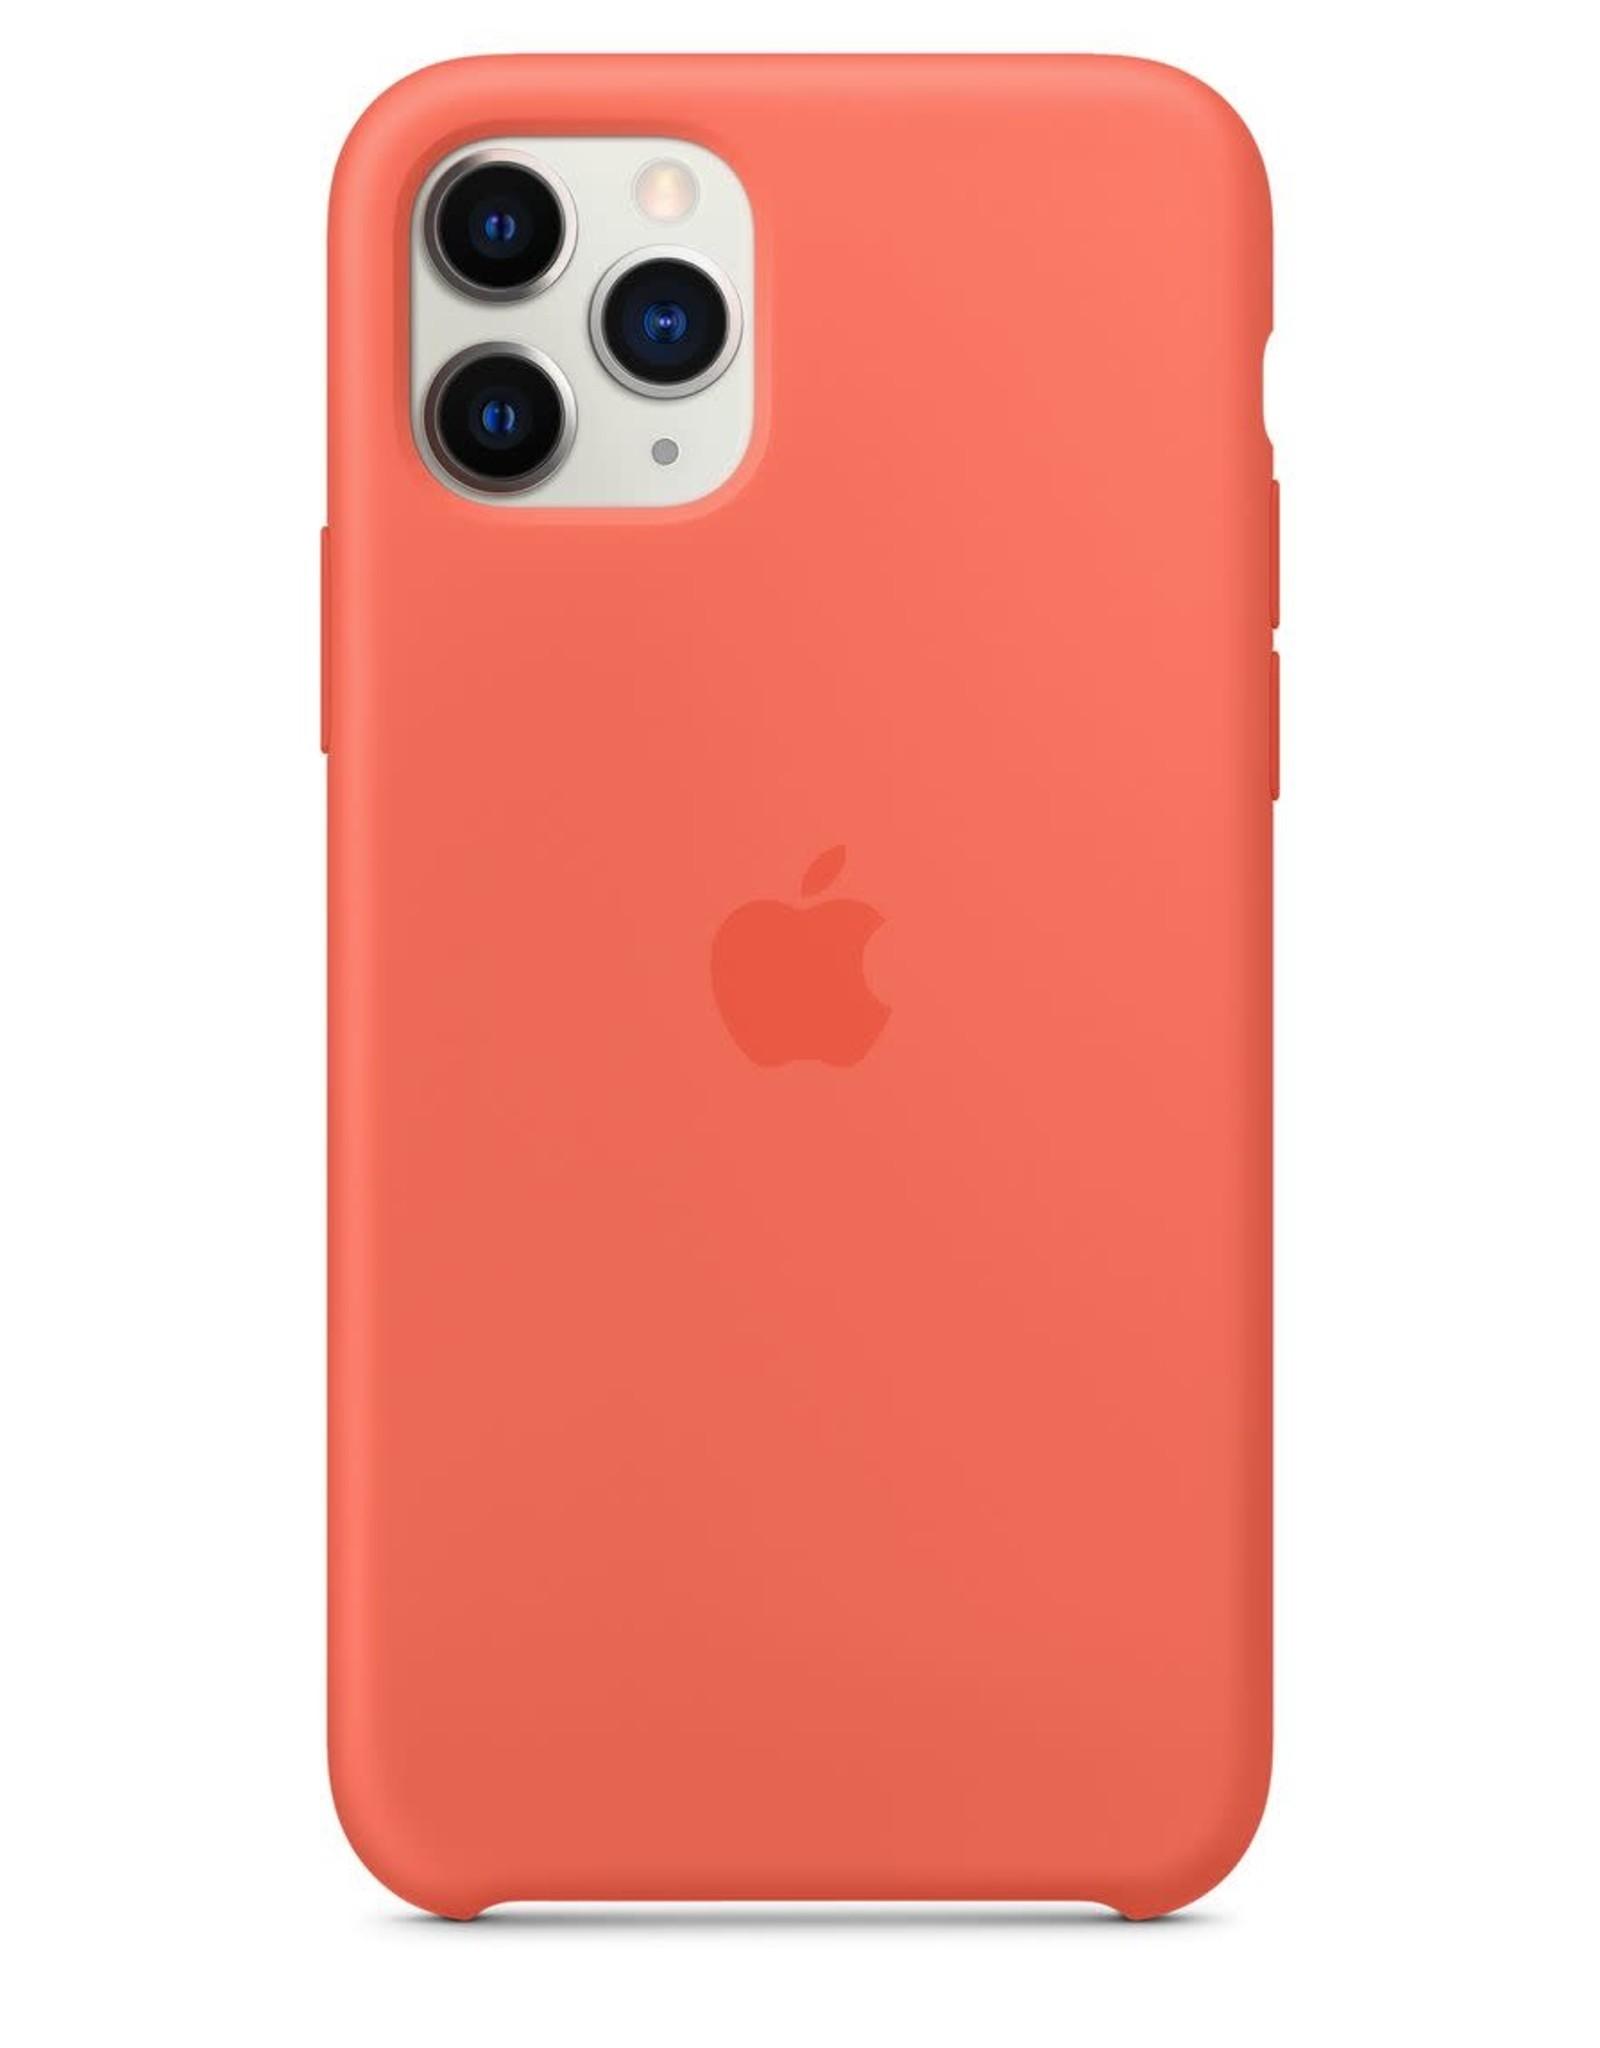 Apple Iphone 11 Pro Max Silicone Case